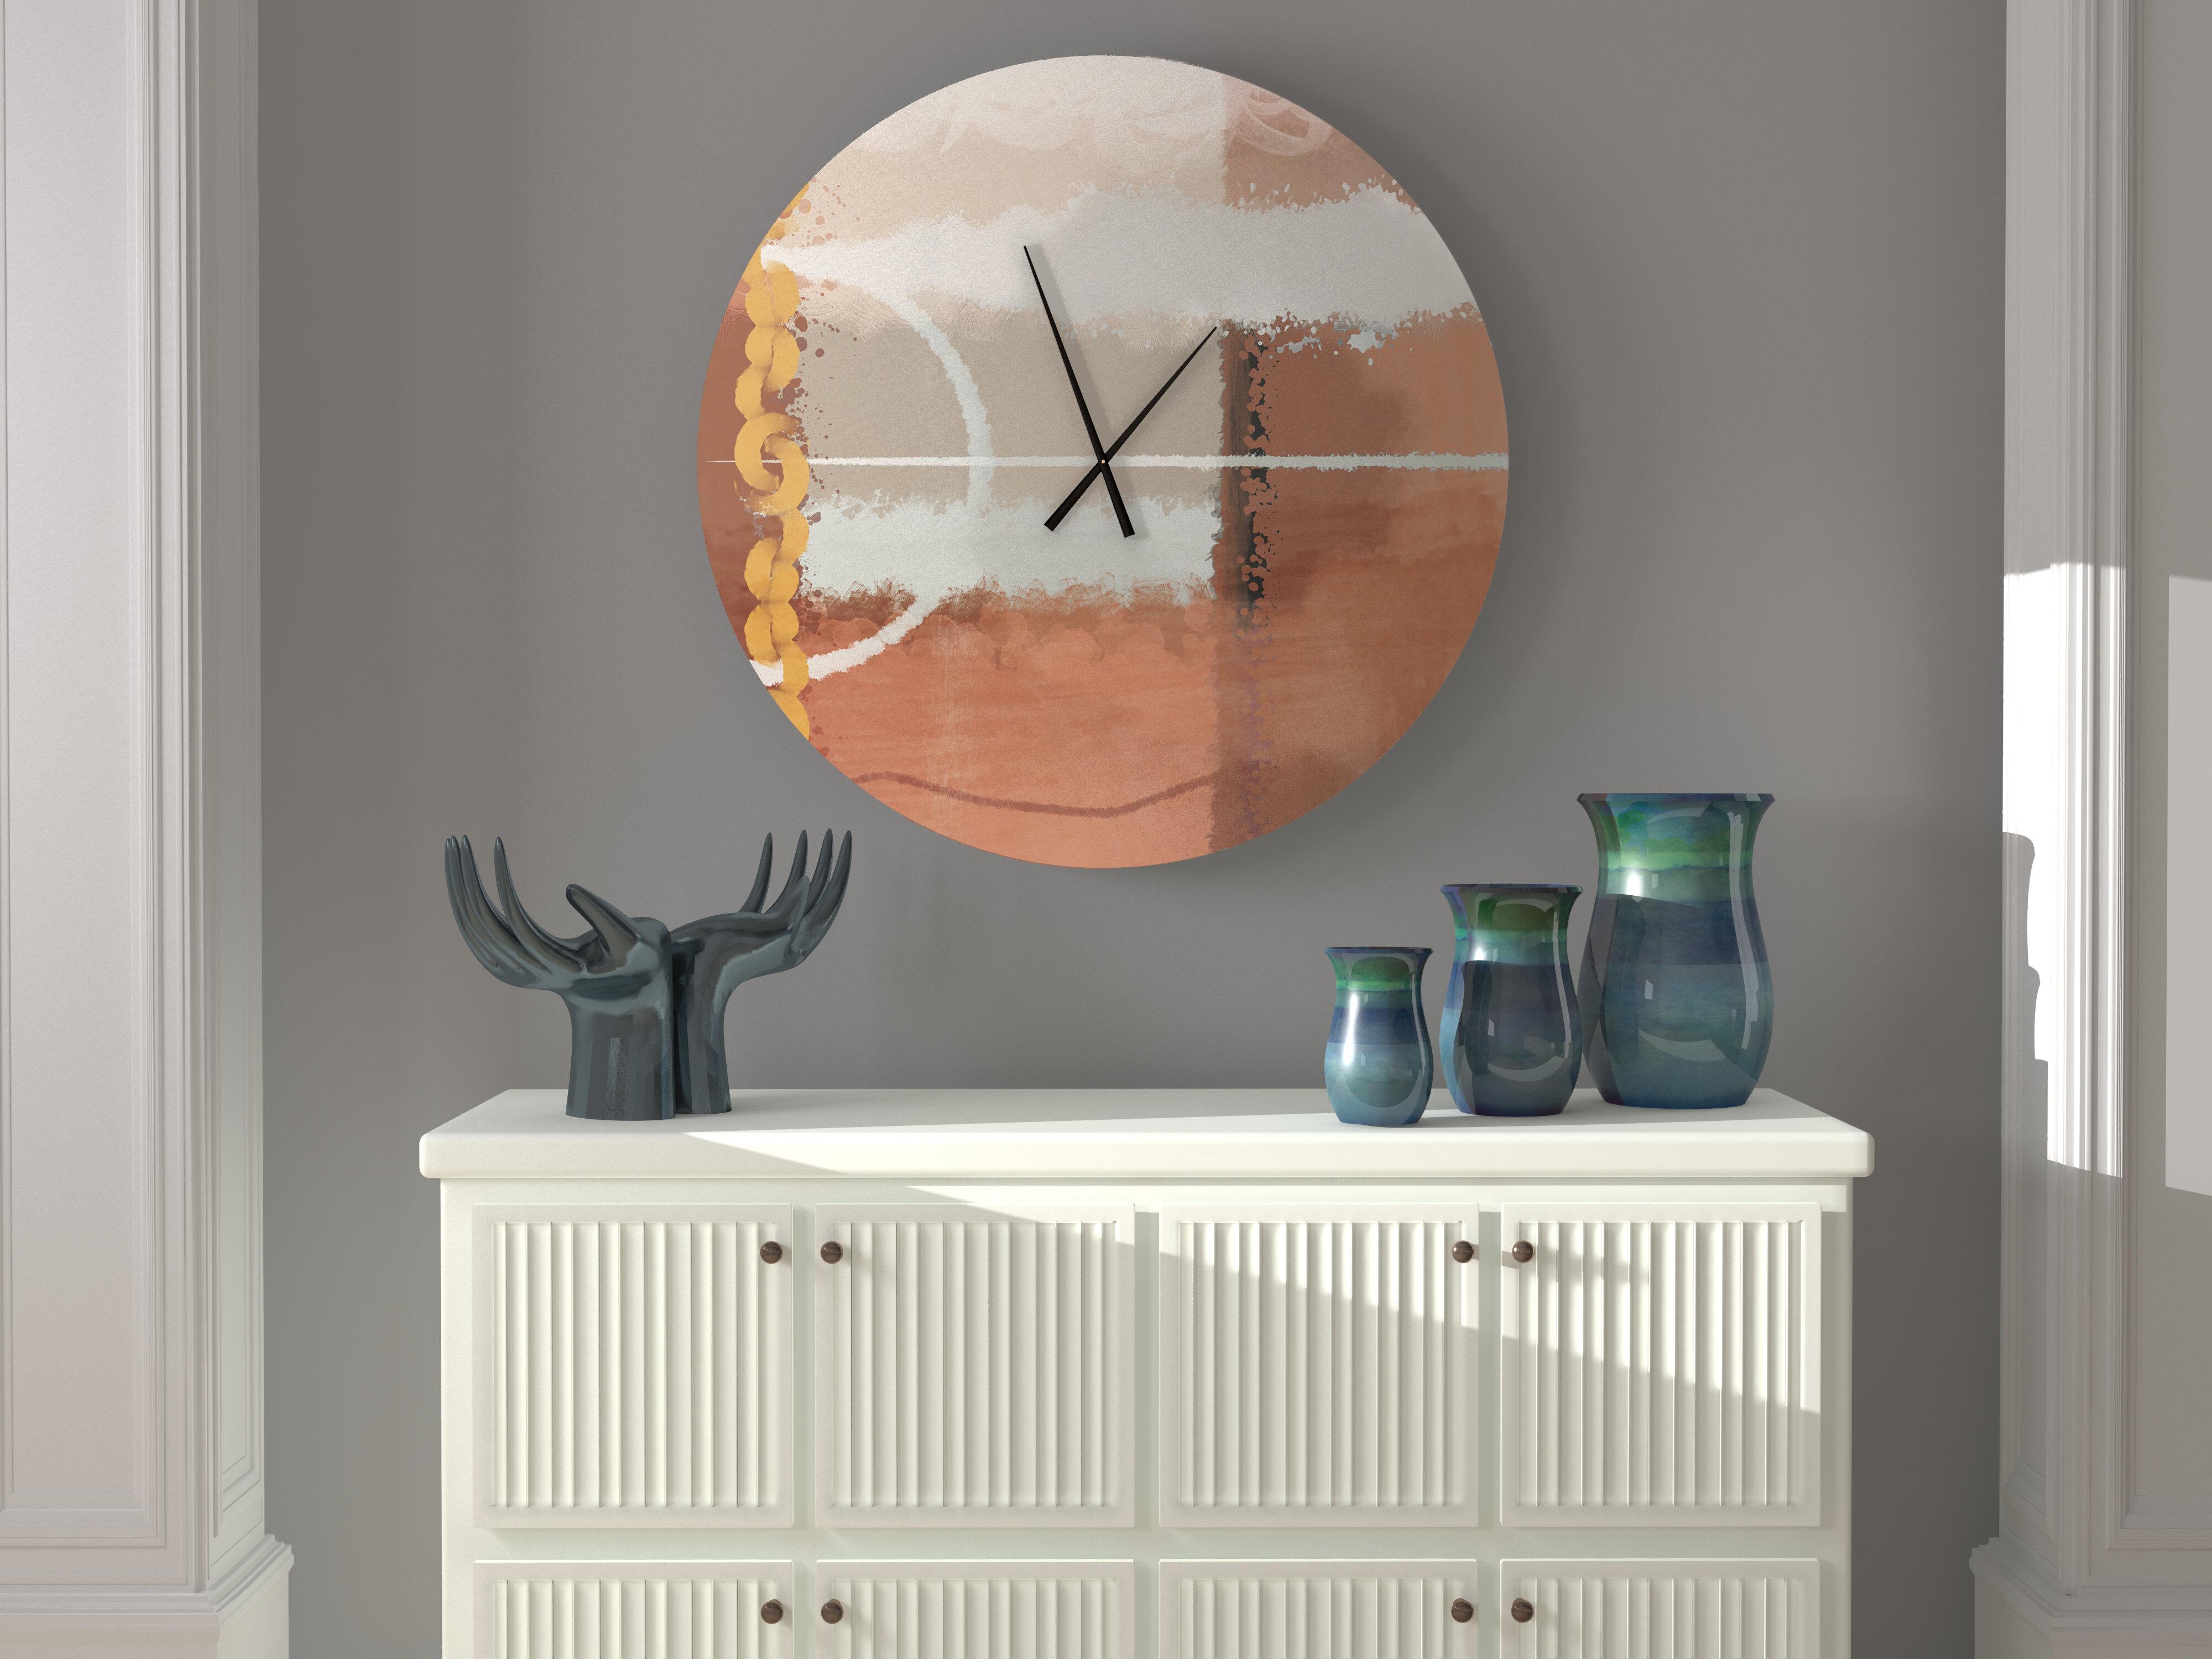 Ebern Designs Autonomous Unsurpassed Abstract Wall Clock Wayfair